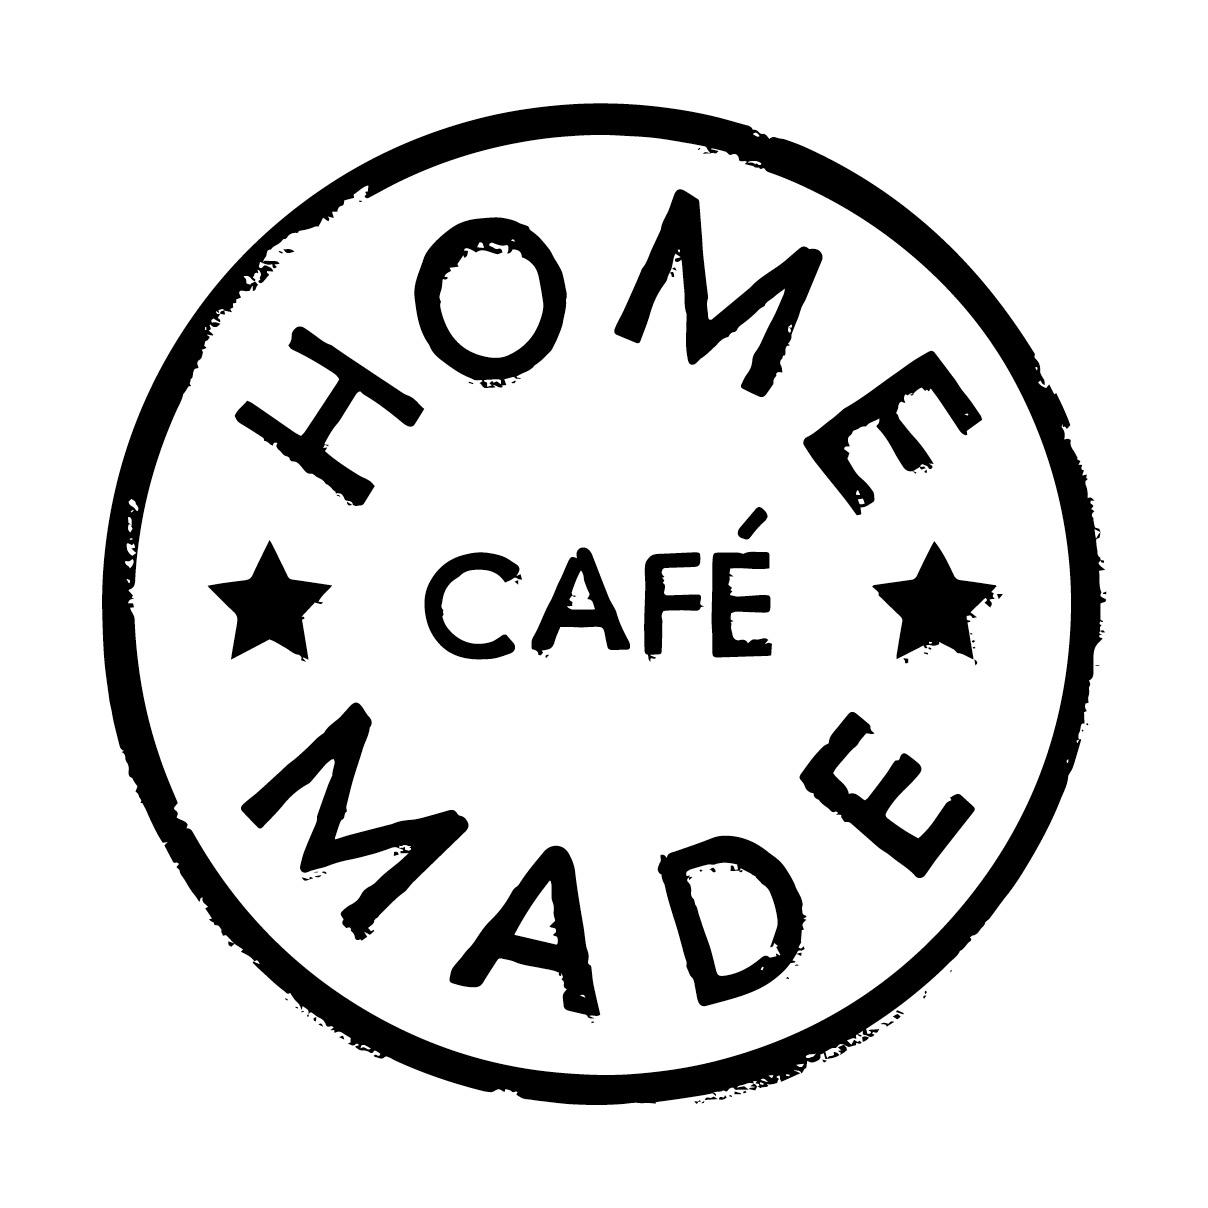 Image-DVP-Cafe6